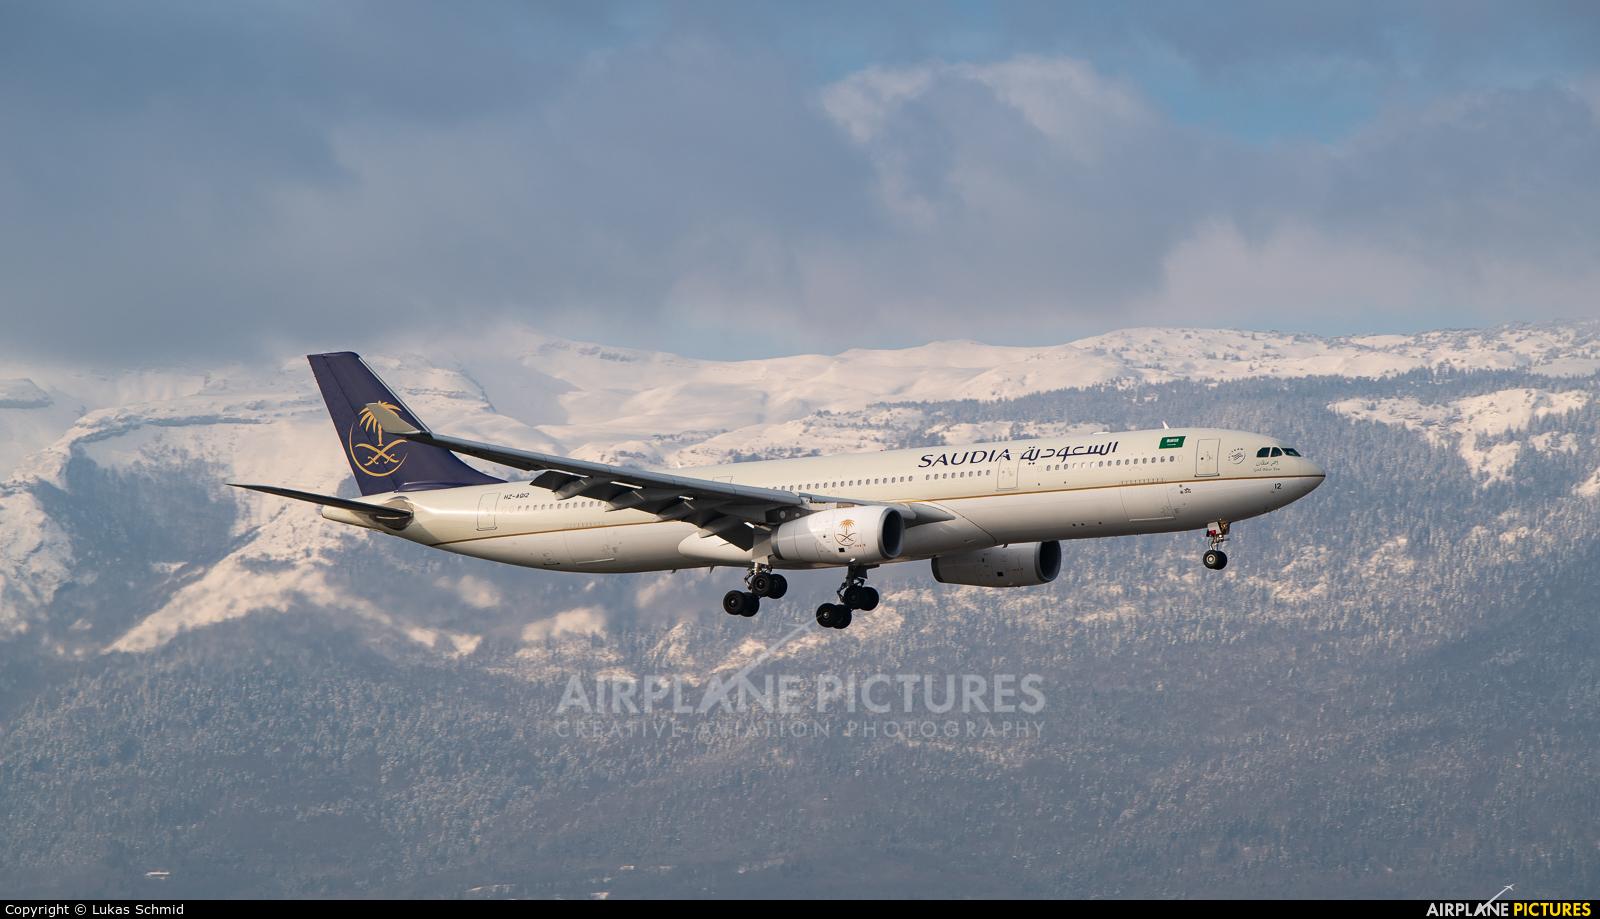 Saudi Arabian Airlines HZ-AQ12 aircraft at Geneva Intl